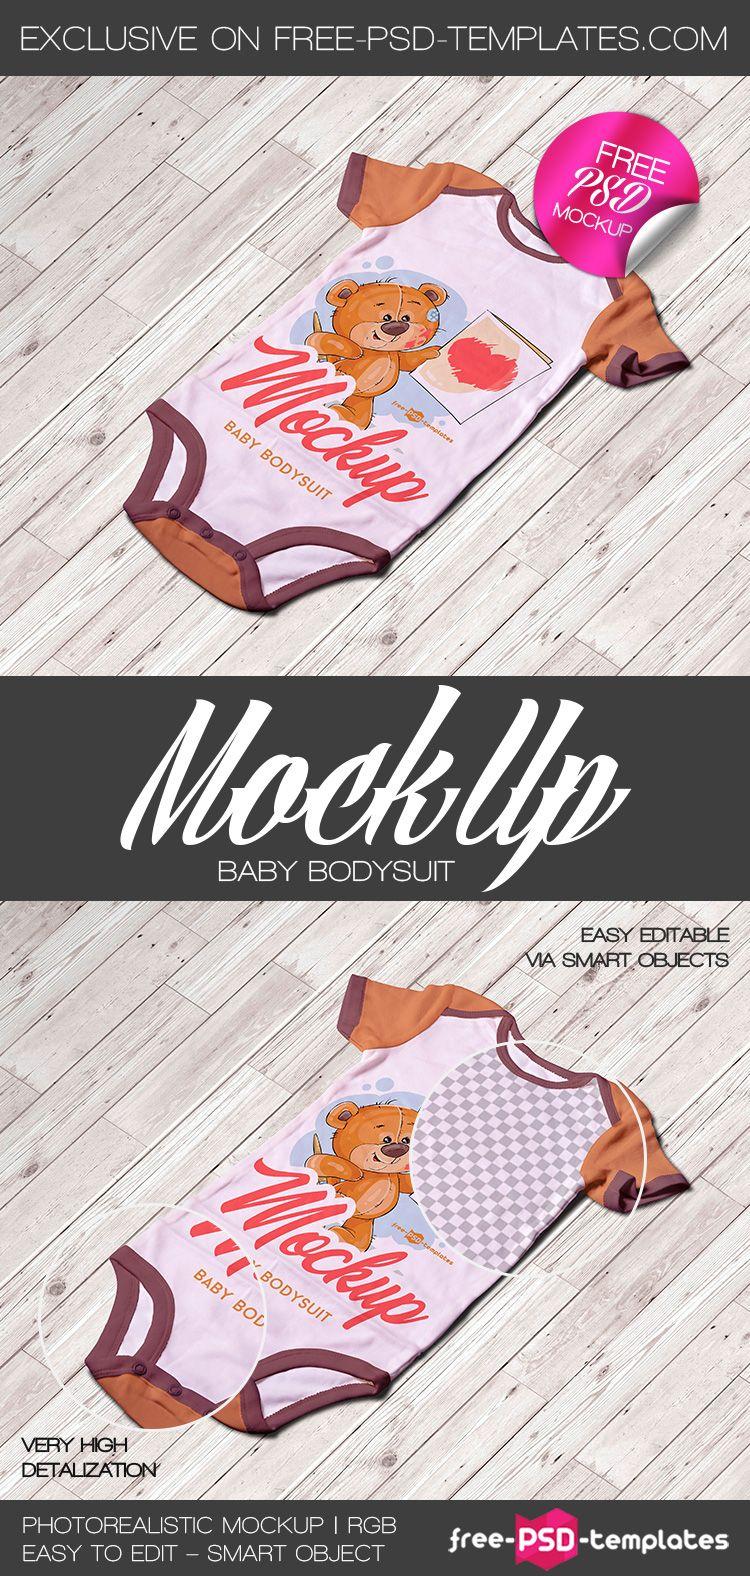 Baby Bodysuit PSD Mockup Template